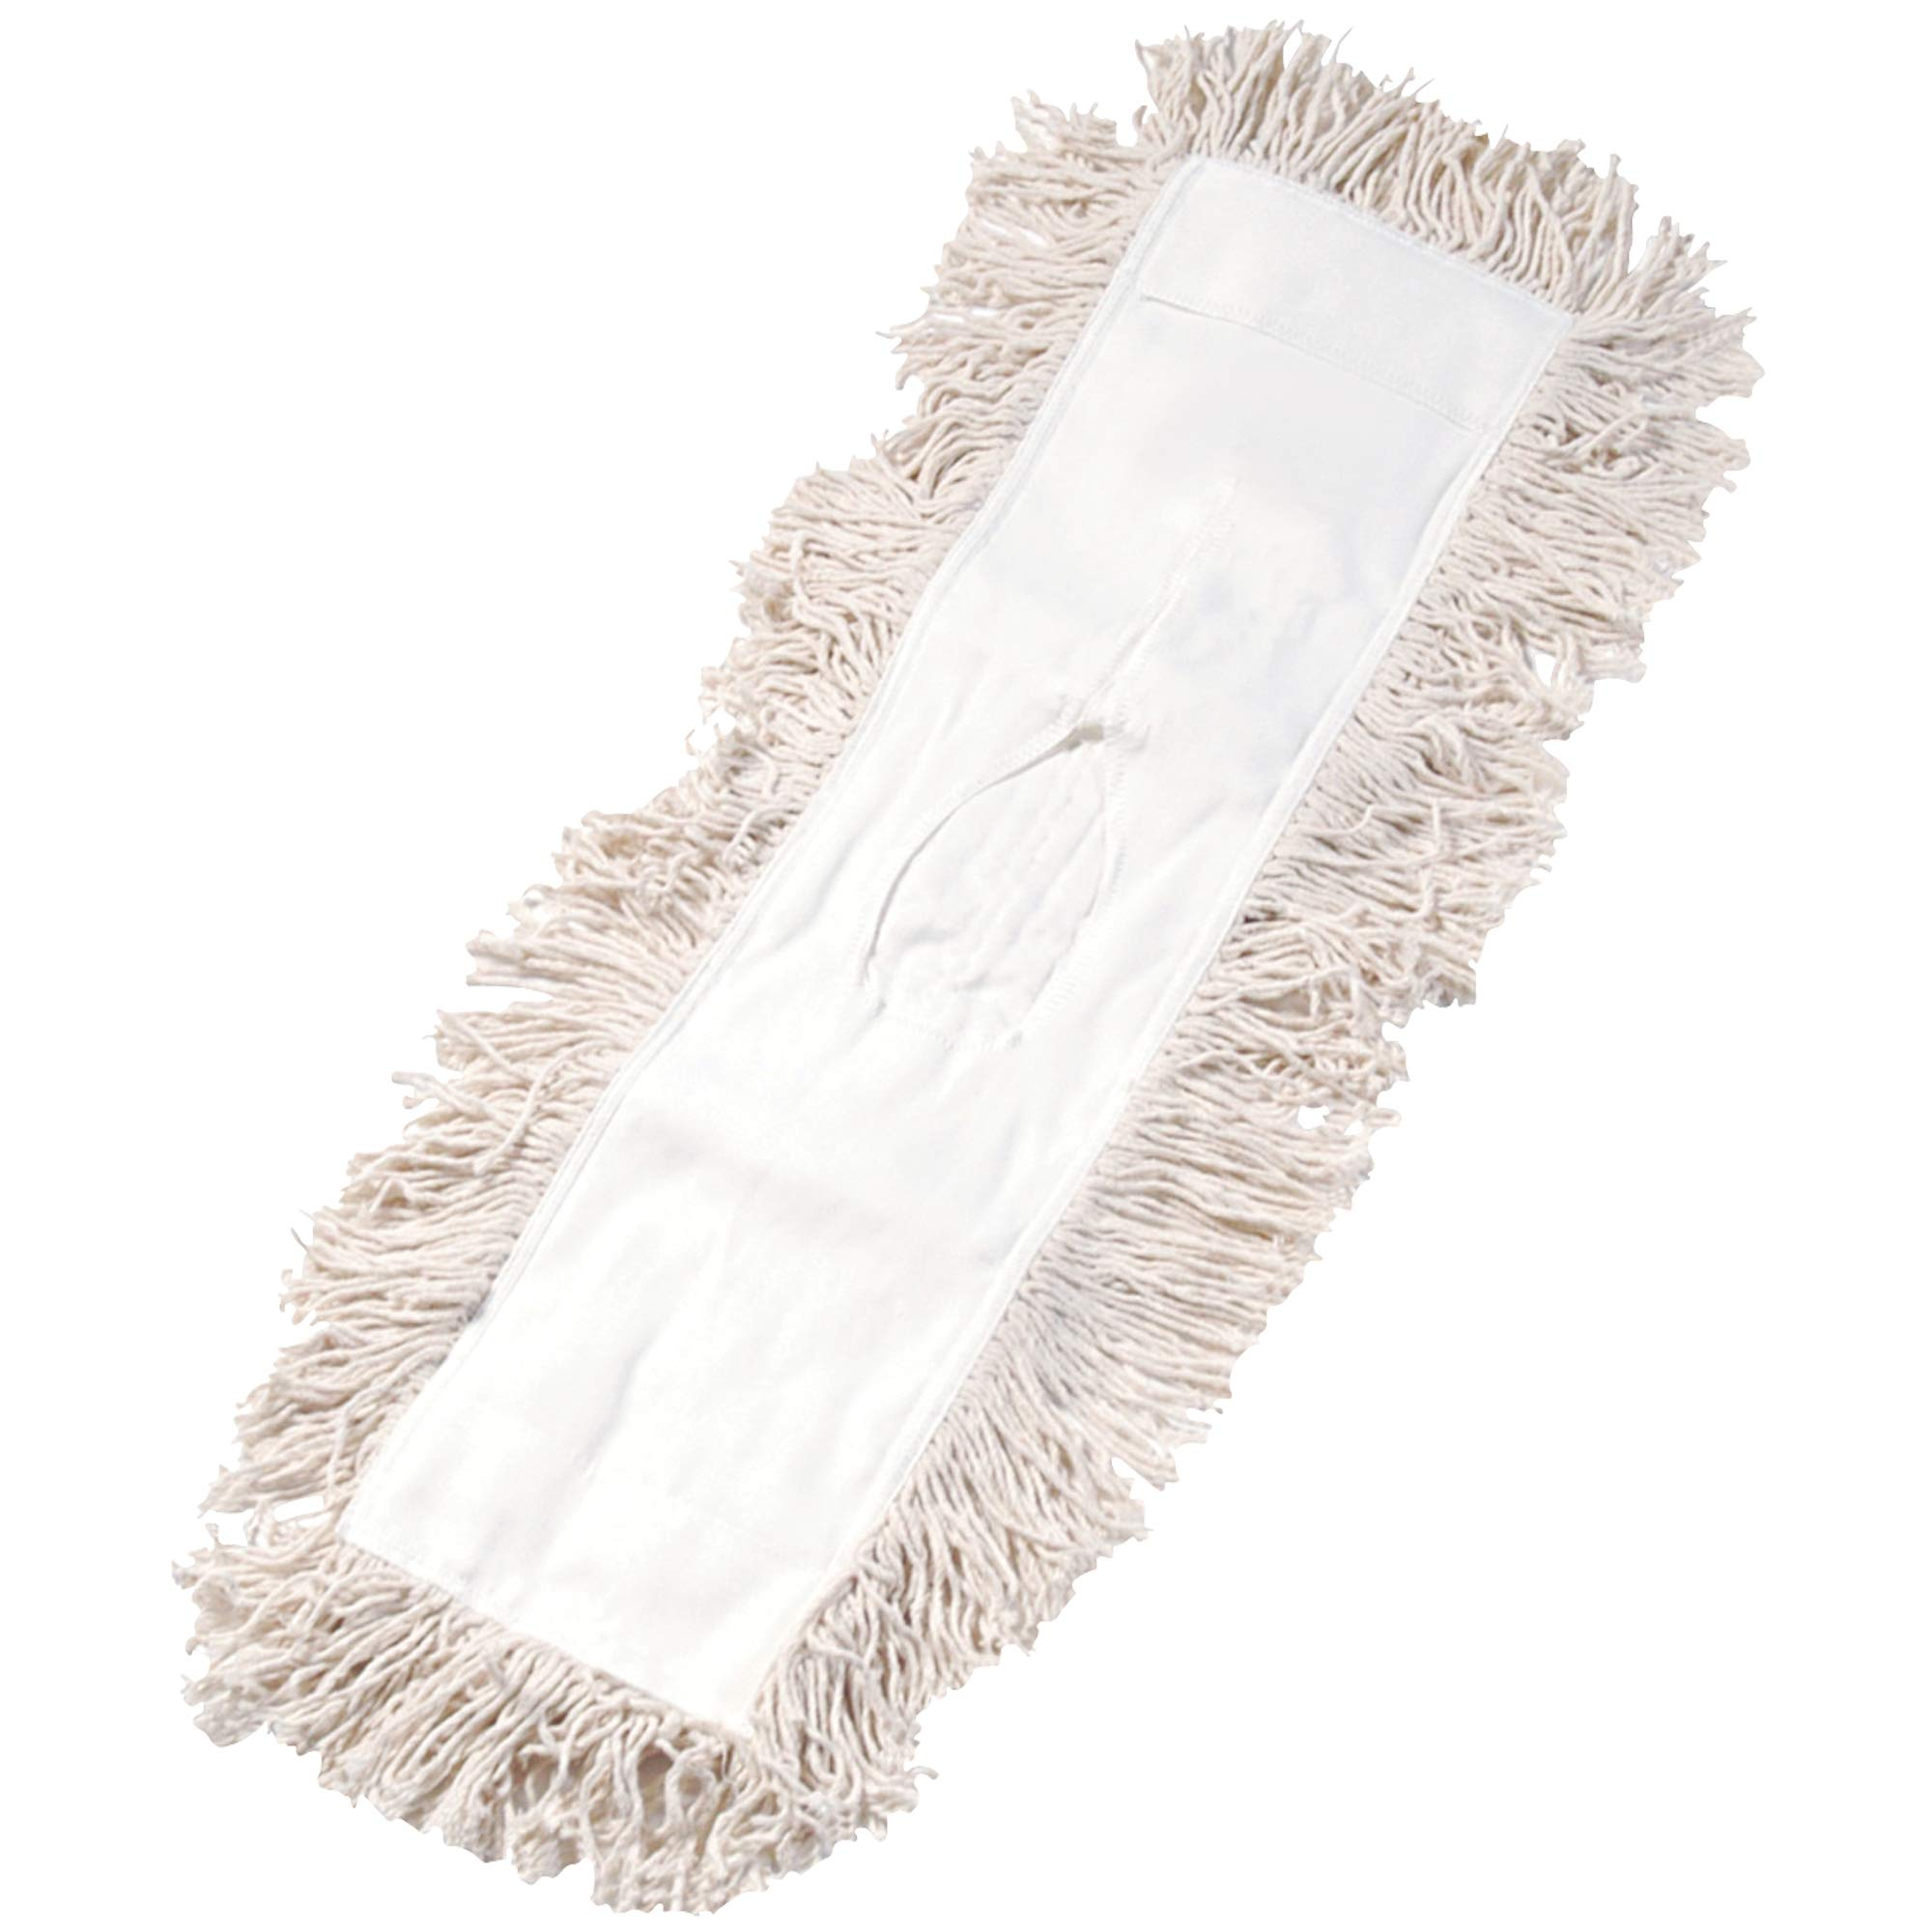 Economy Cut-End Dust Mop Head, 24'', White, 1/Each